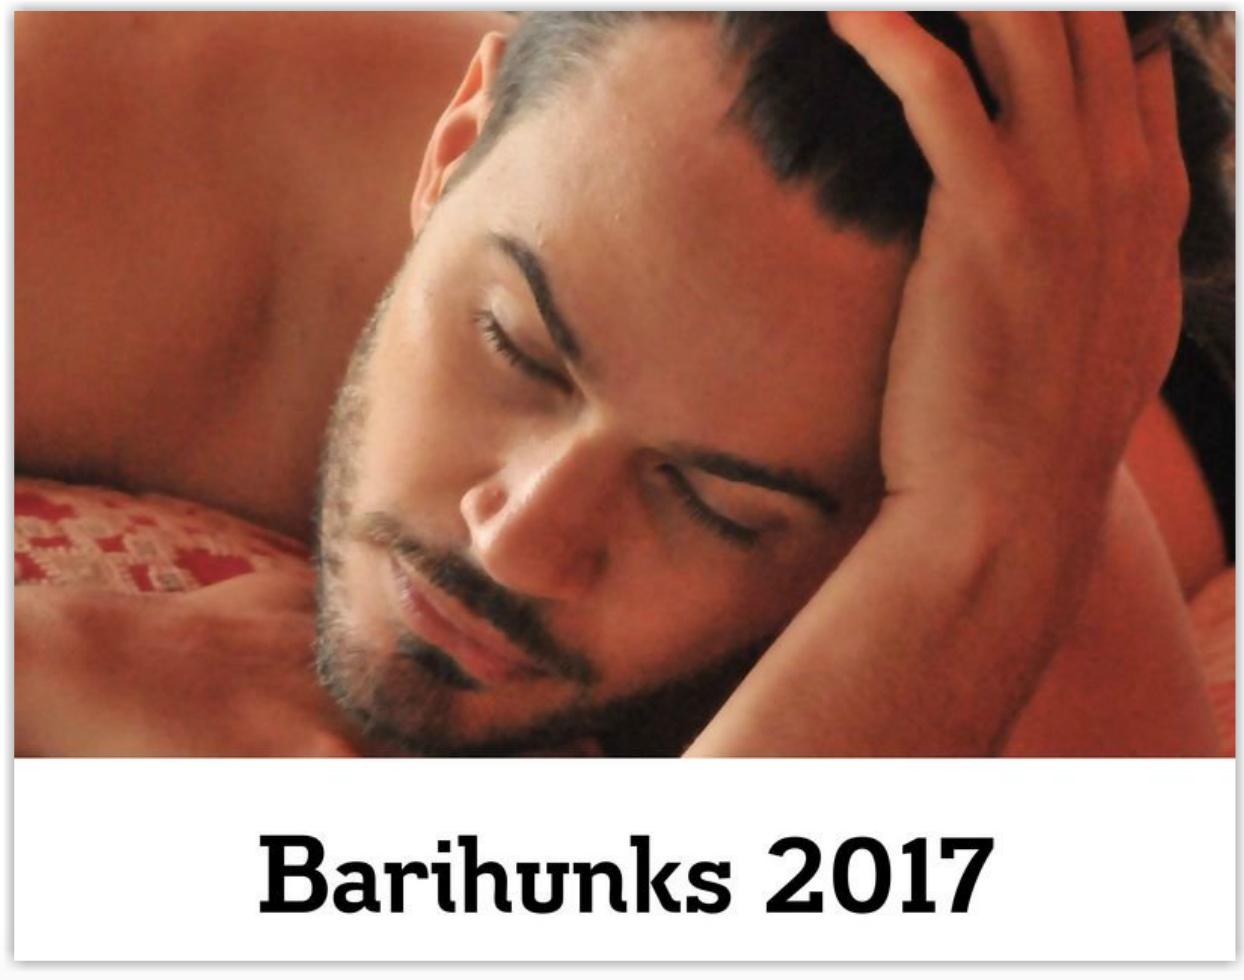 BARIHUNKS